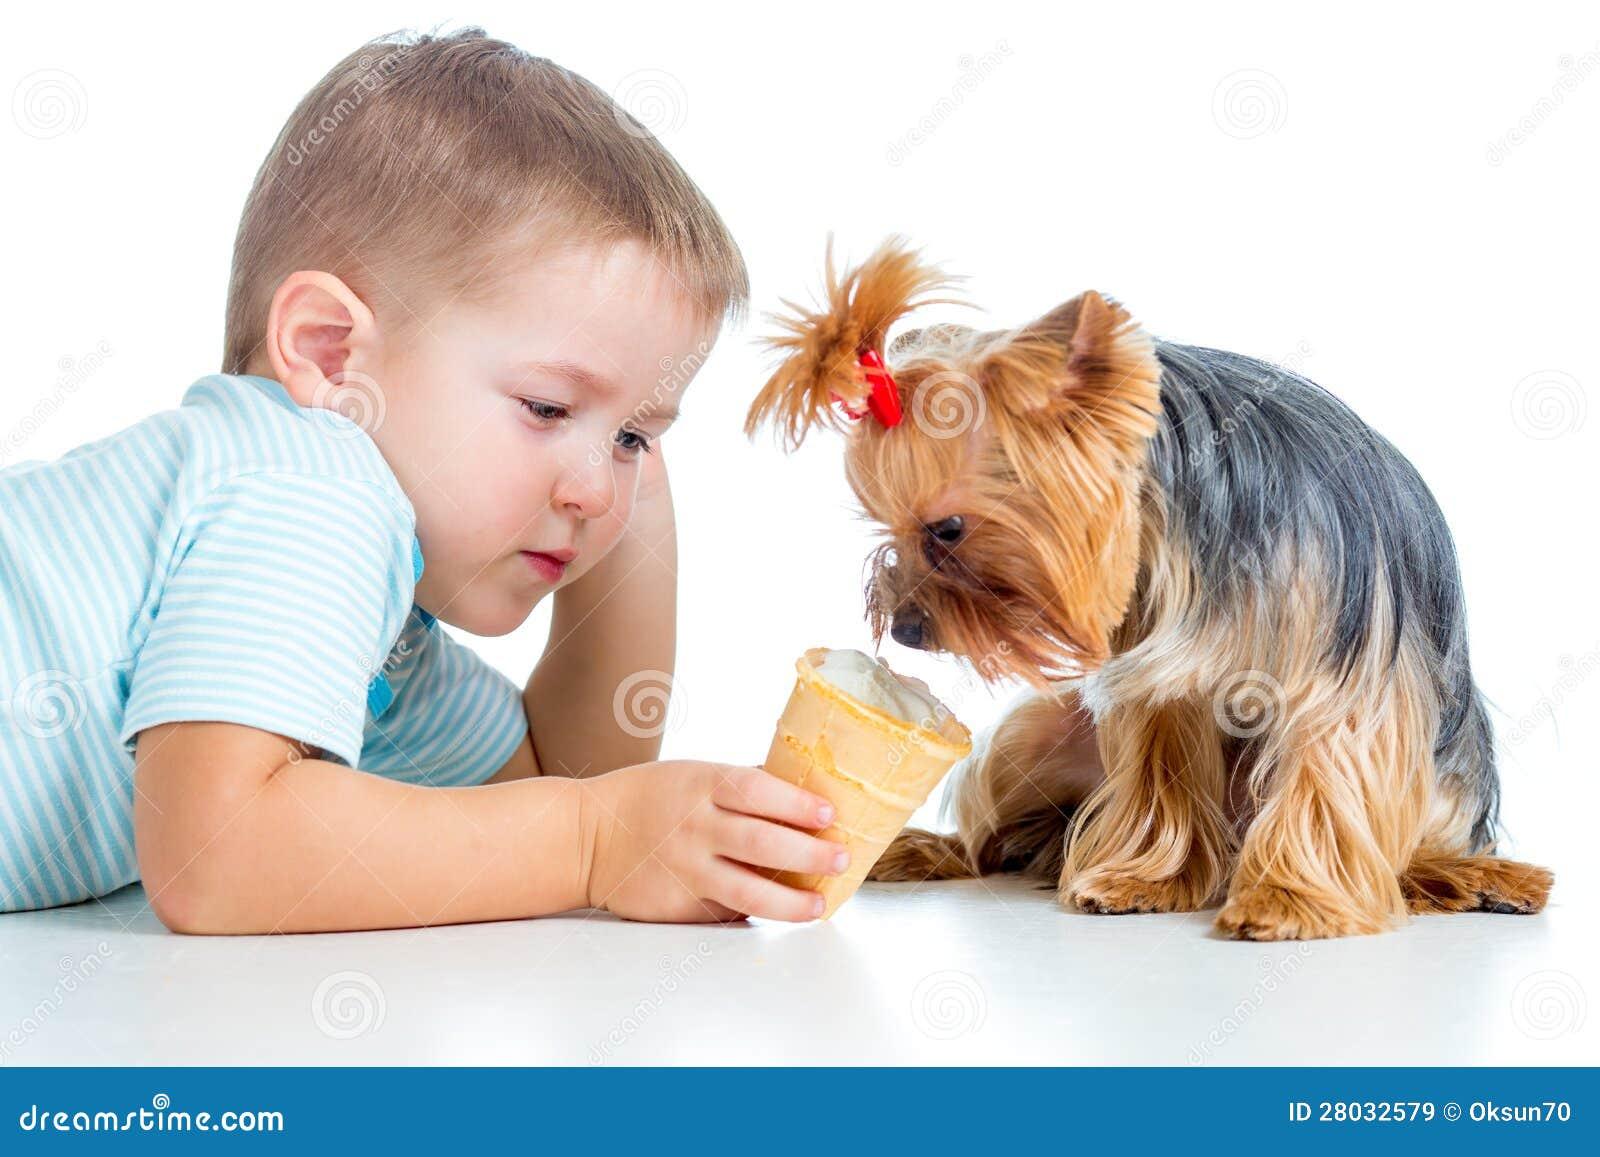 Happy child eating ice-cream isolated